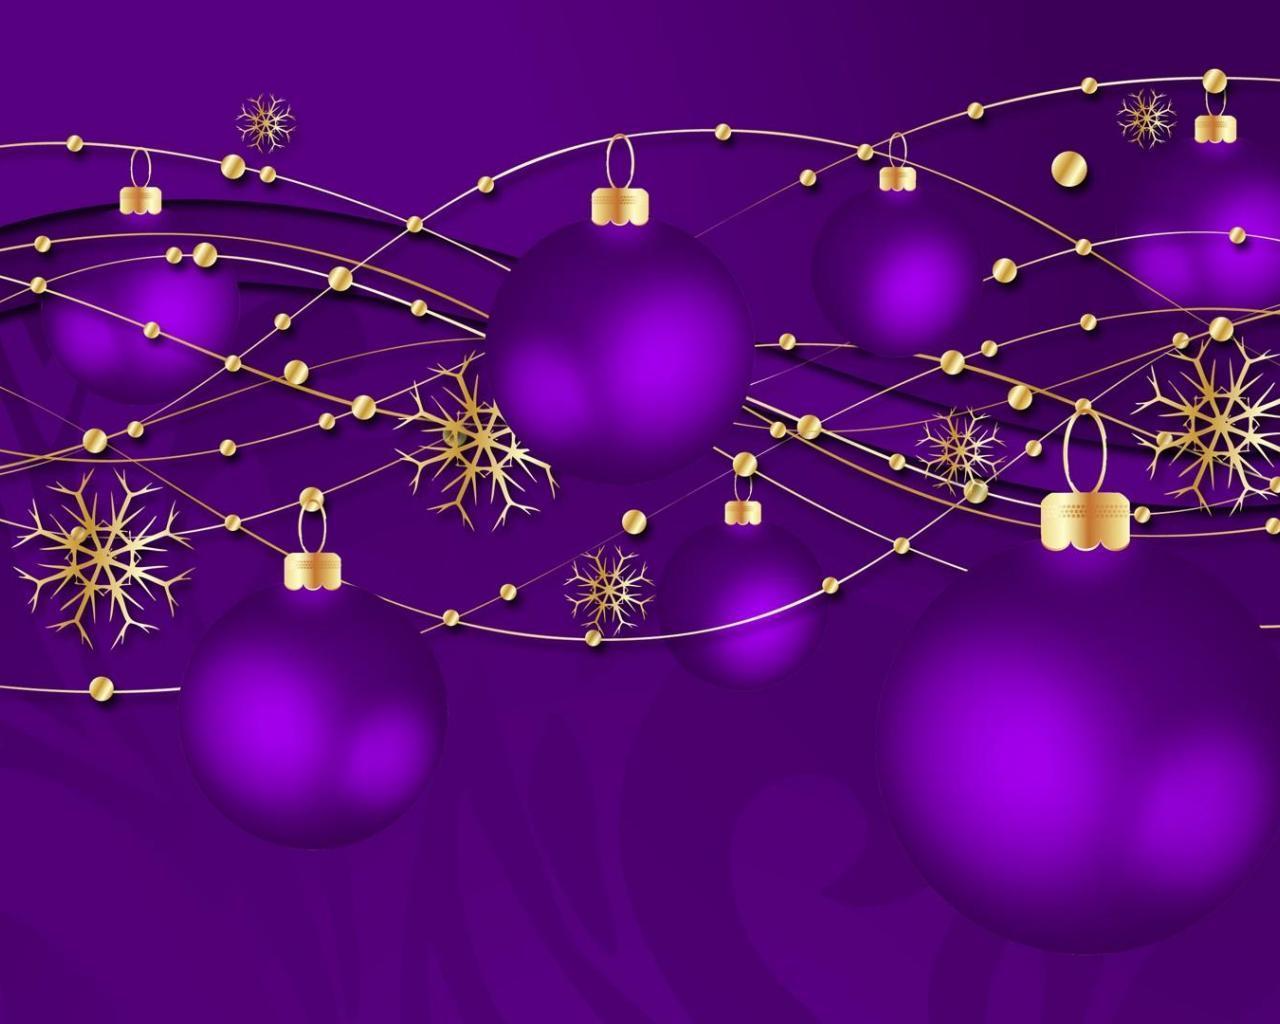 Purple Christmas.Purple Christmas Wallpapers Top Free Purple Christmas